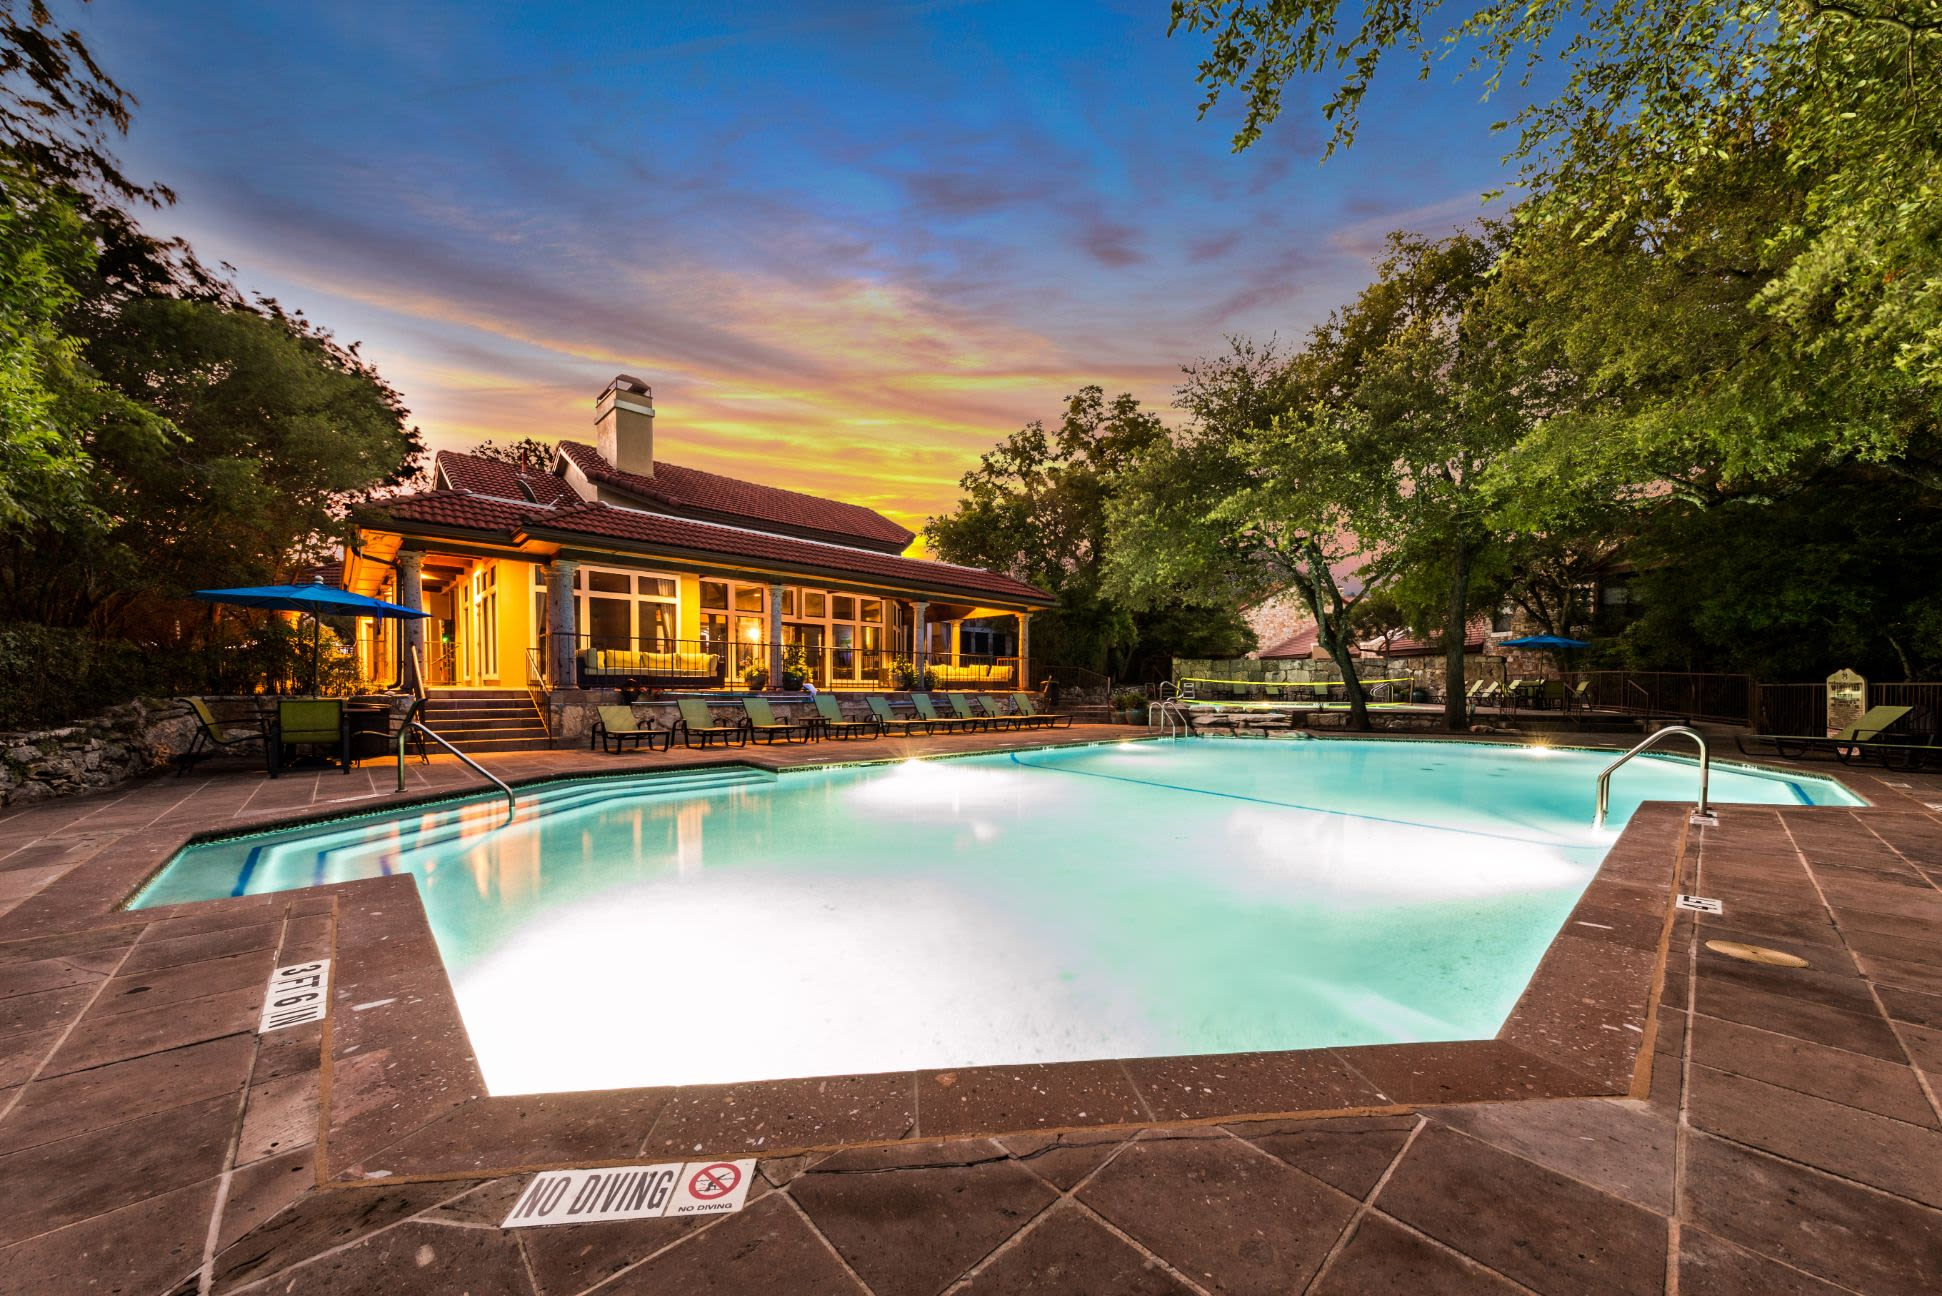 Pool at dusk at Marquis at Caprock Canyon in Austin, Texas